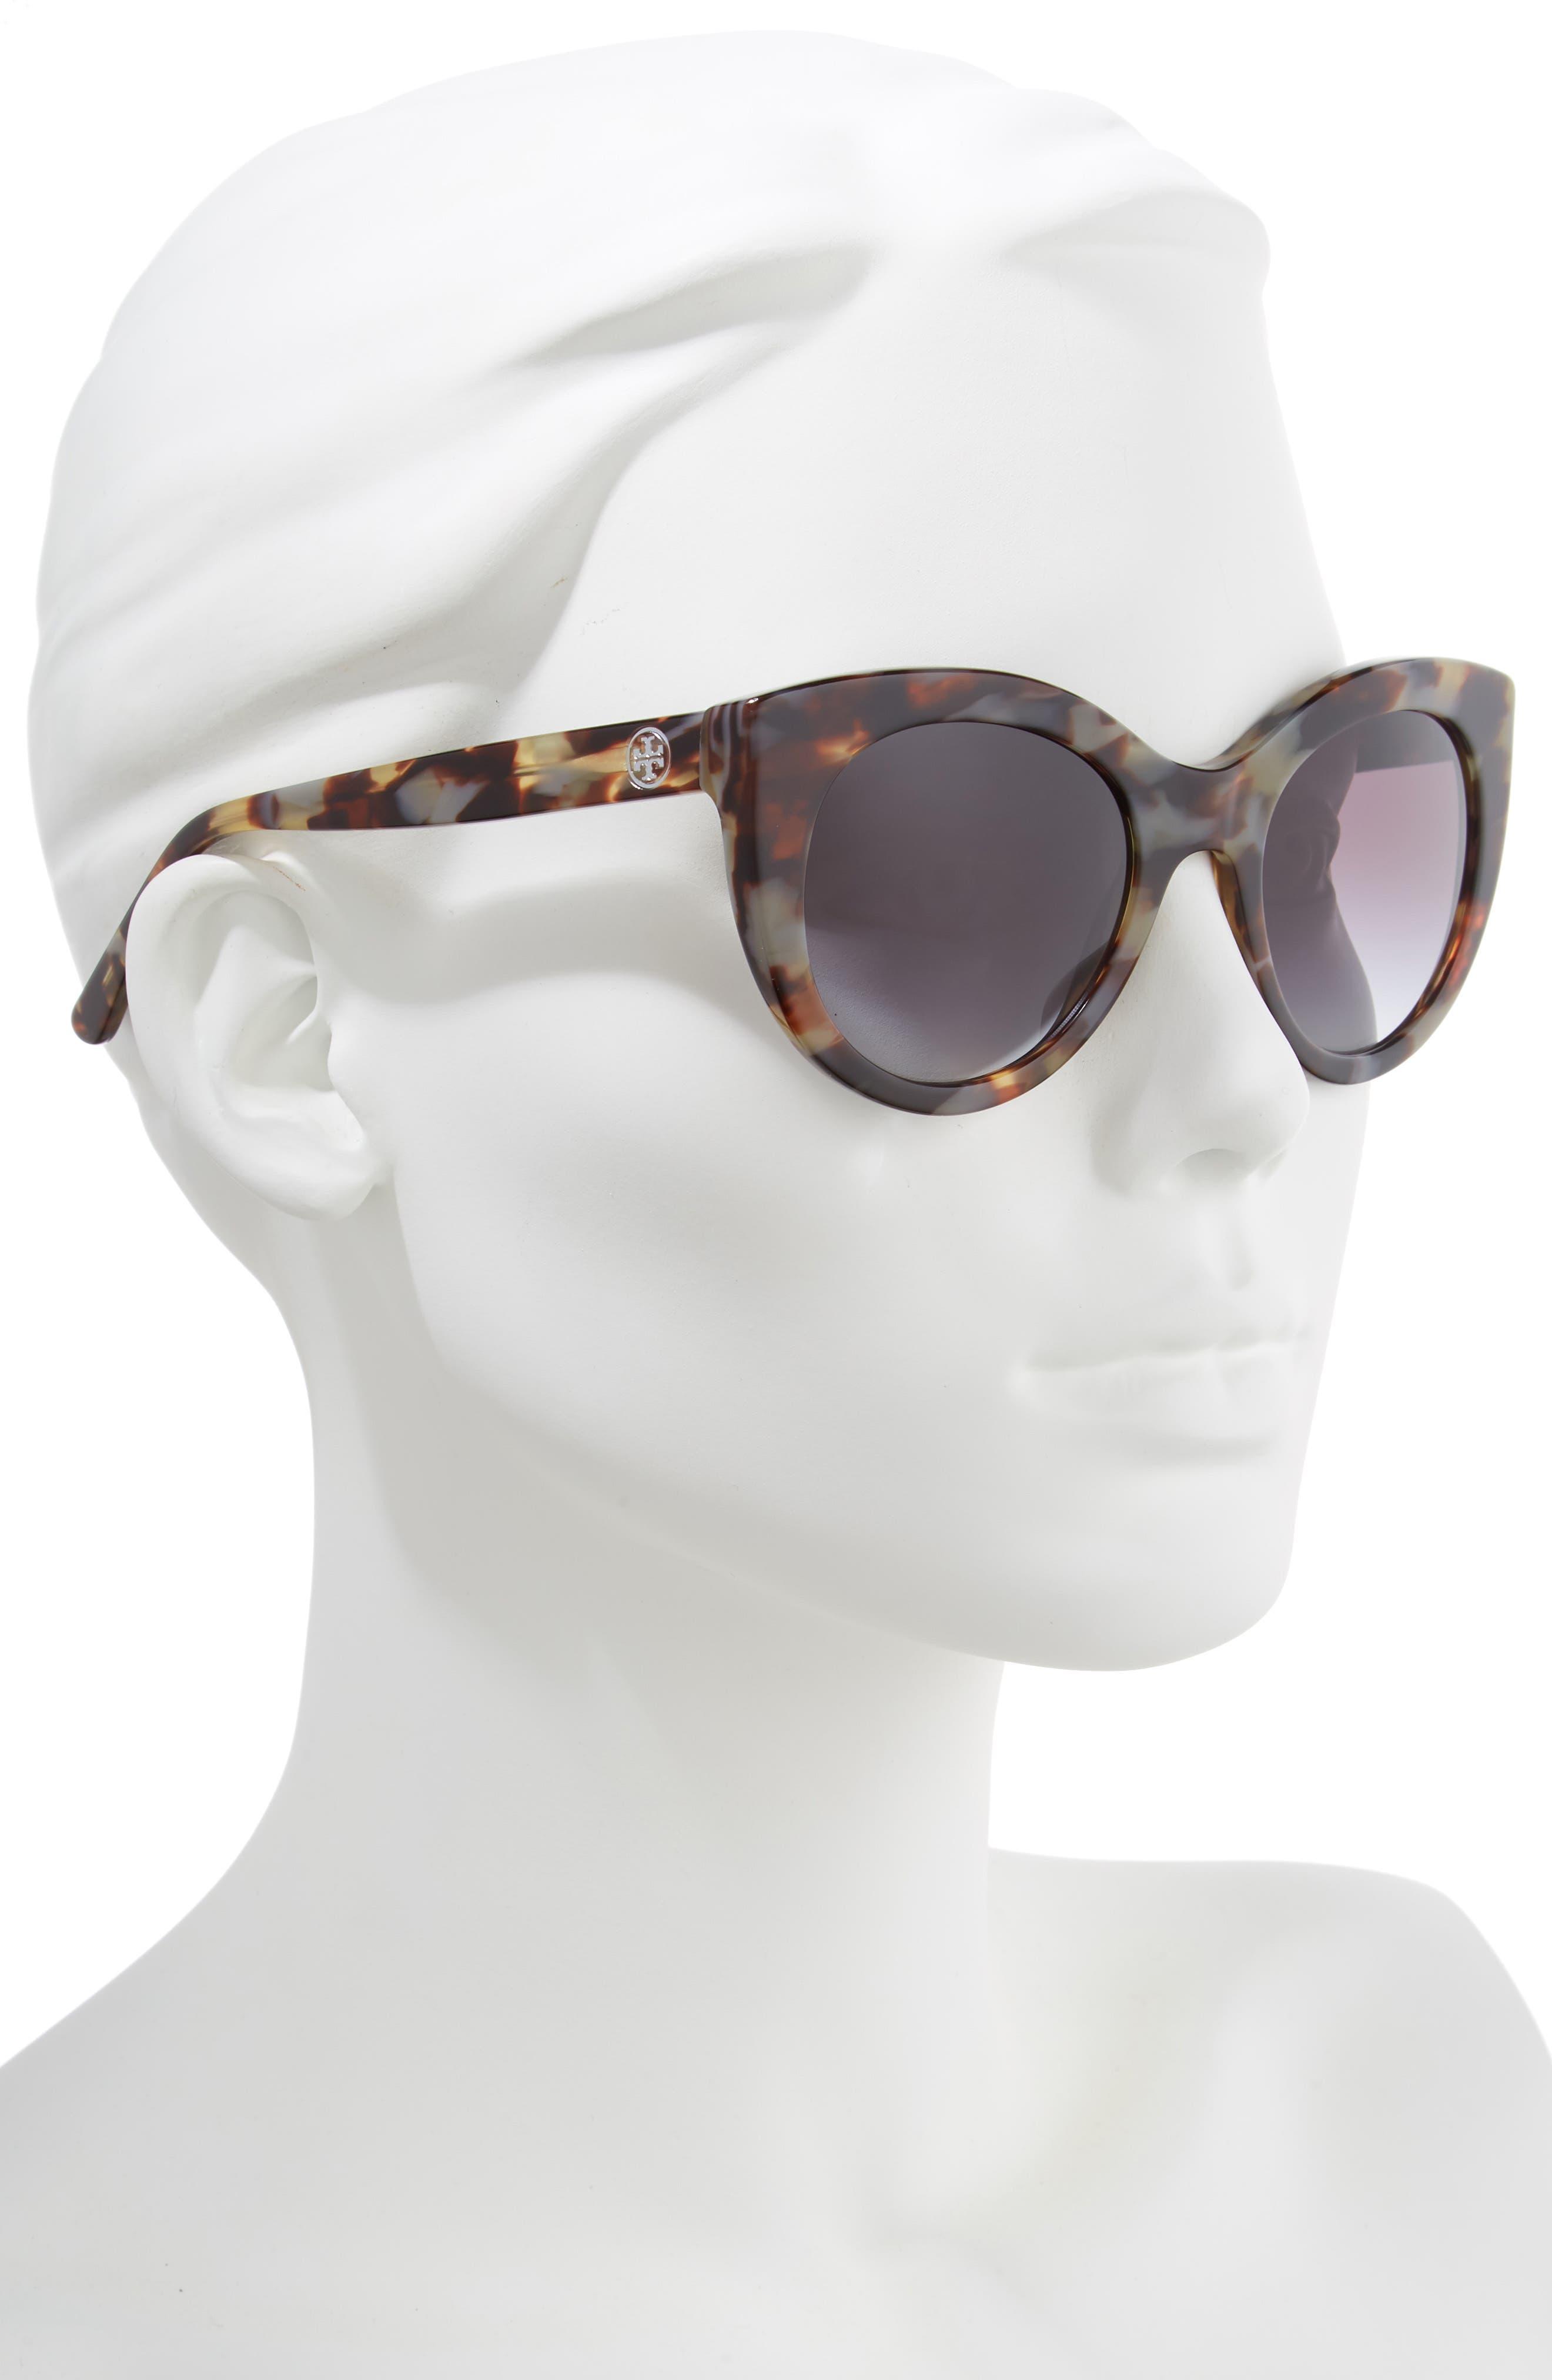 TORY BURCH,                             51mm Cat Eye Sunglasses,                             Alternate thumbnail 2, color,                             001